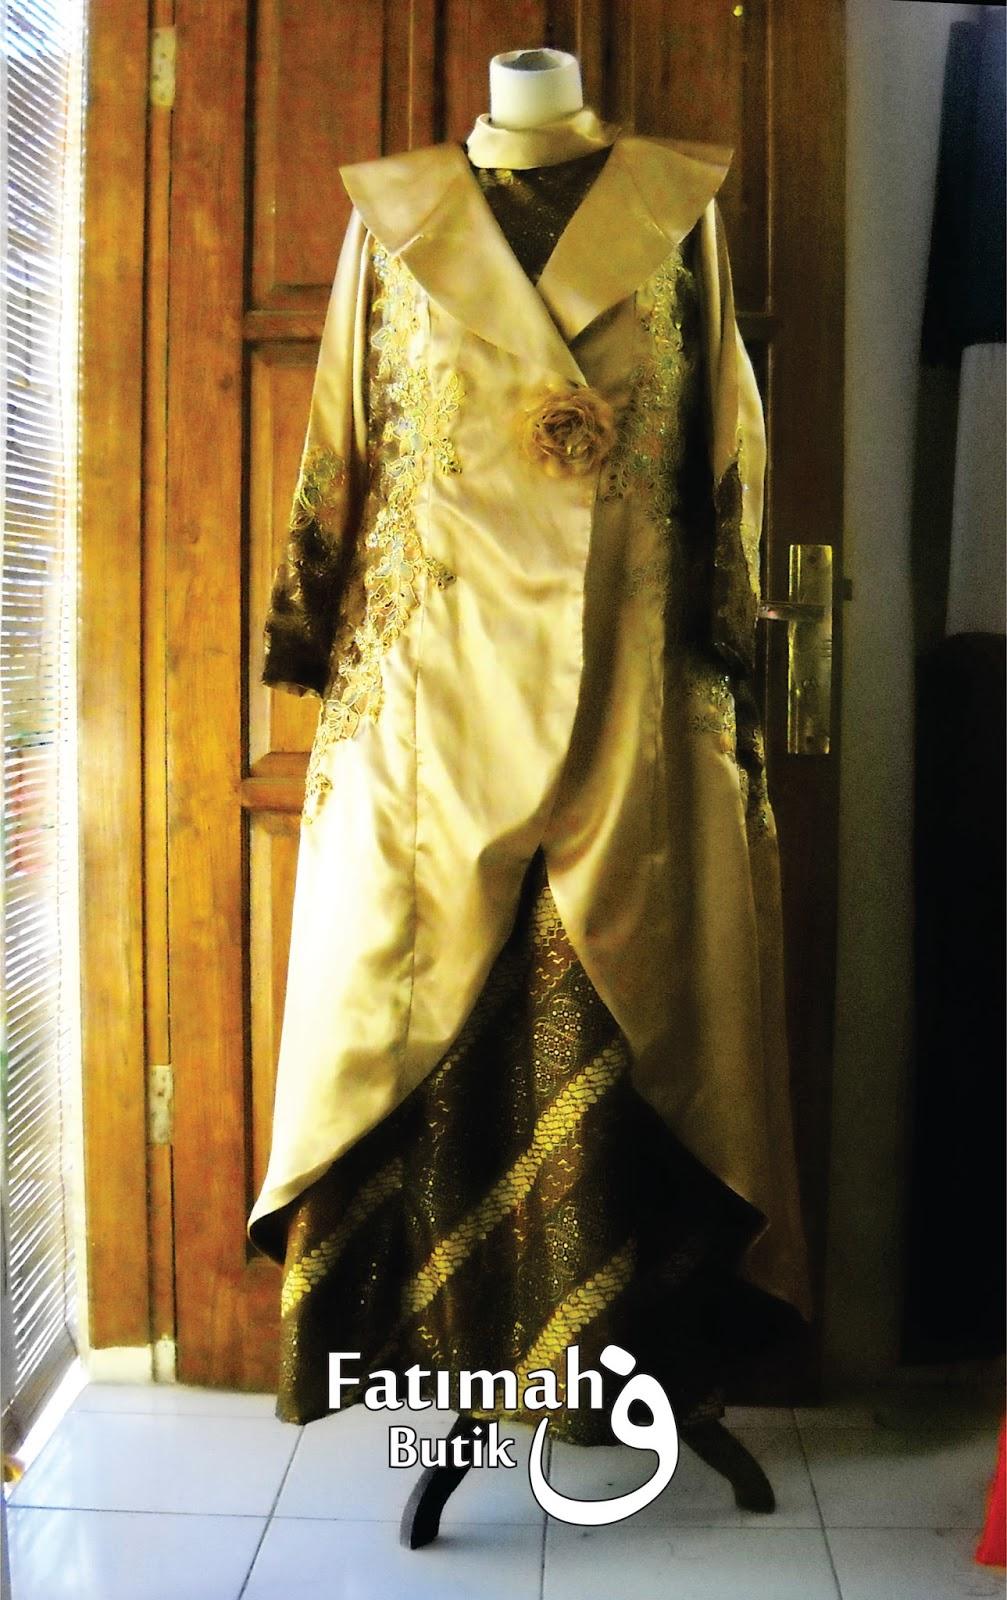 Butik Fatimah Juli 2015